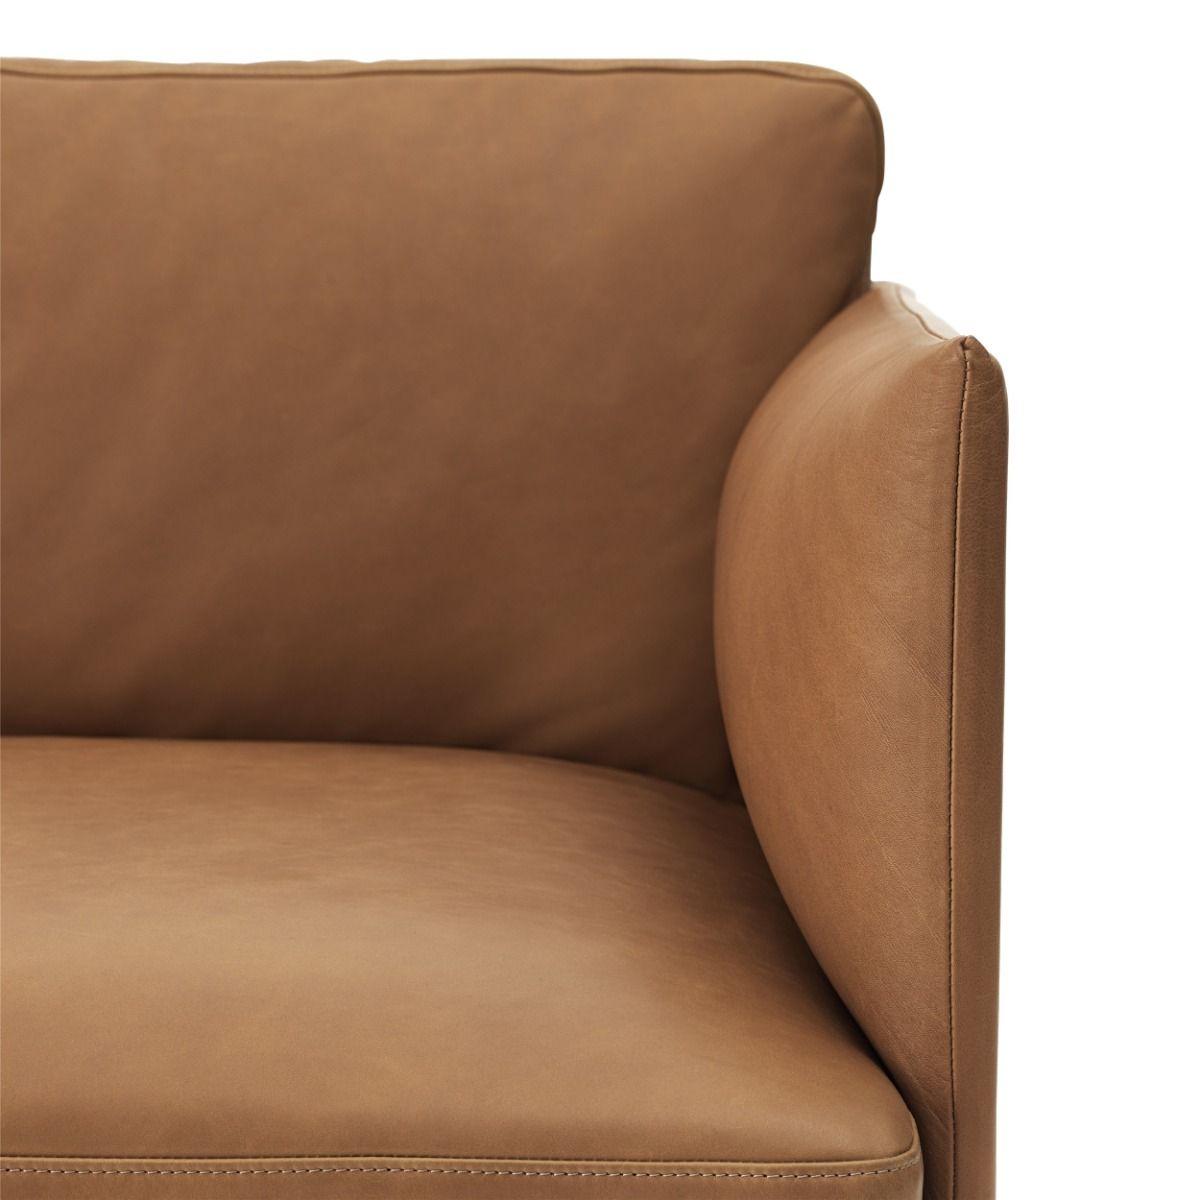 Muuto Outline 2 Seater Sofa